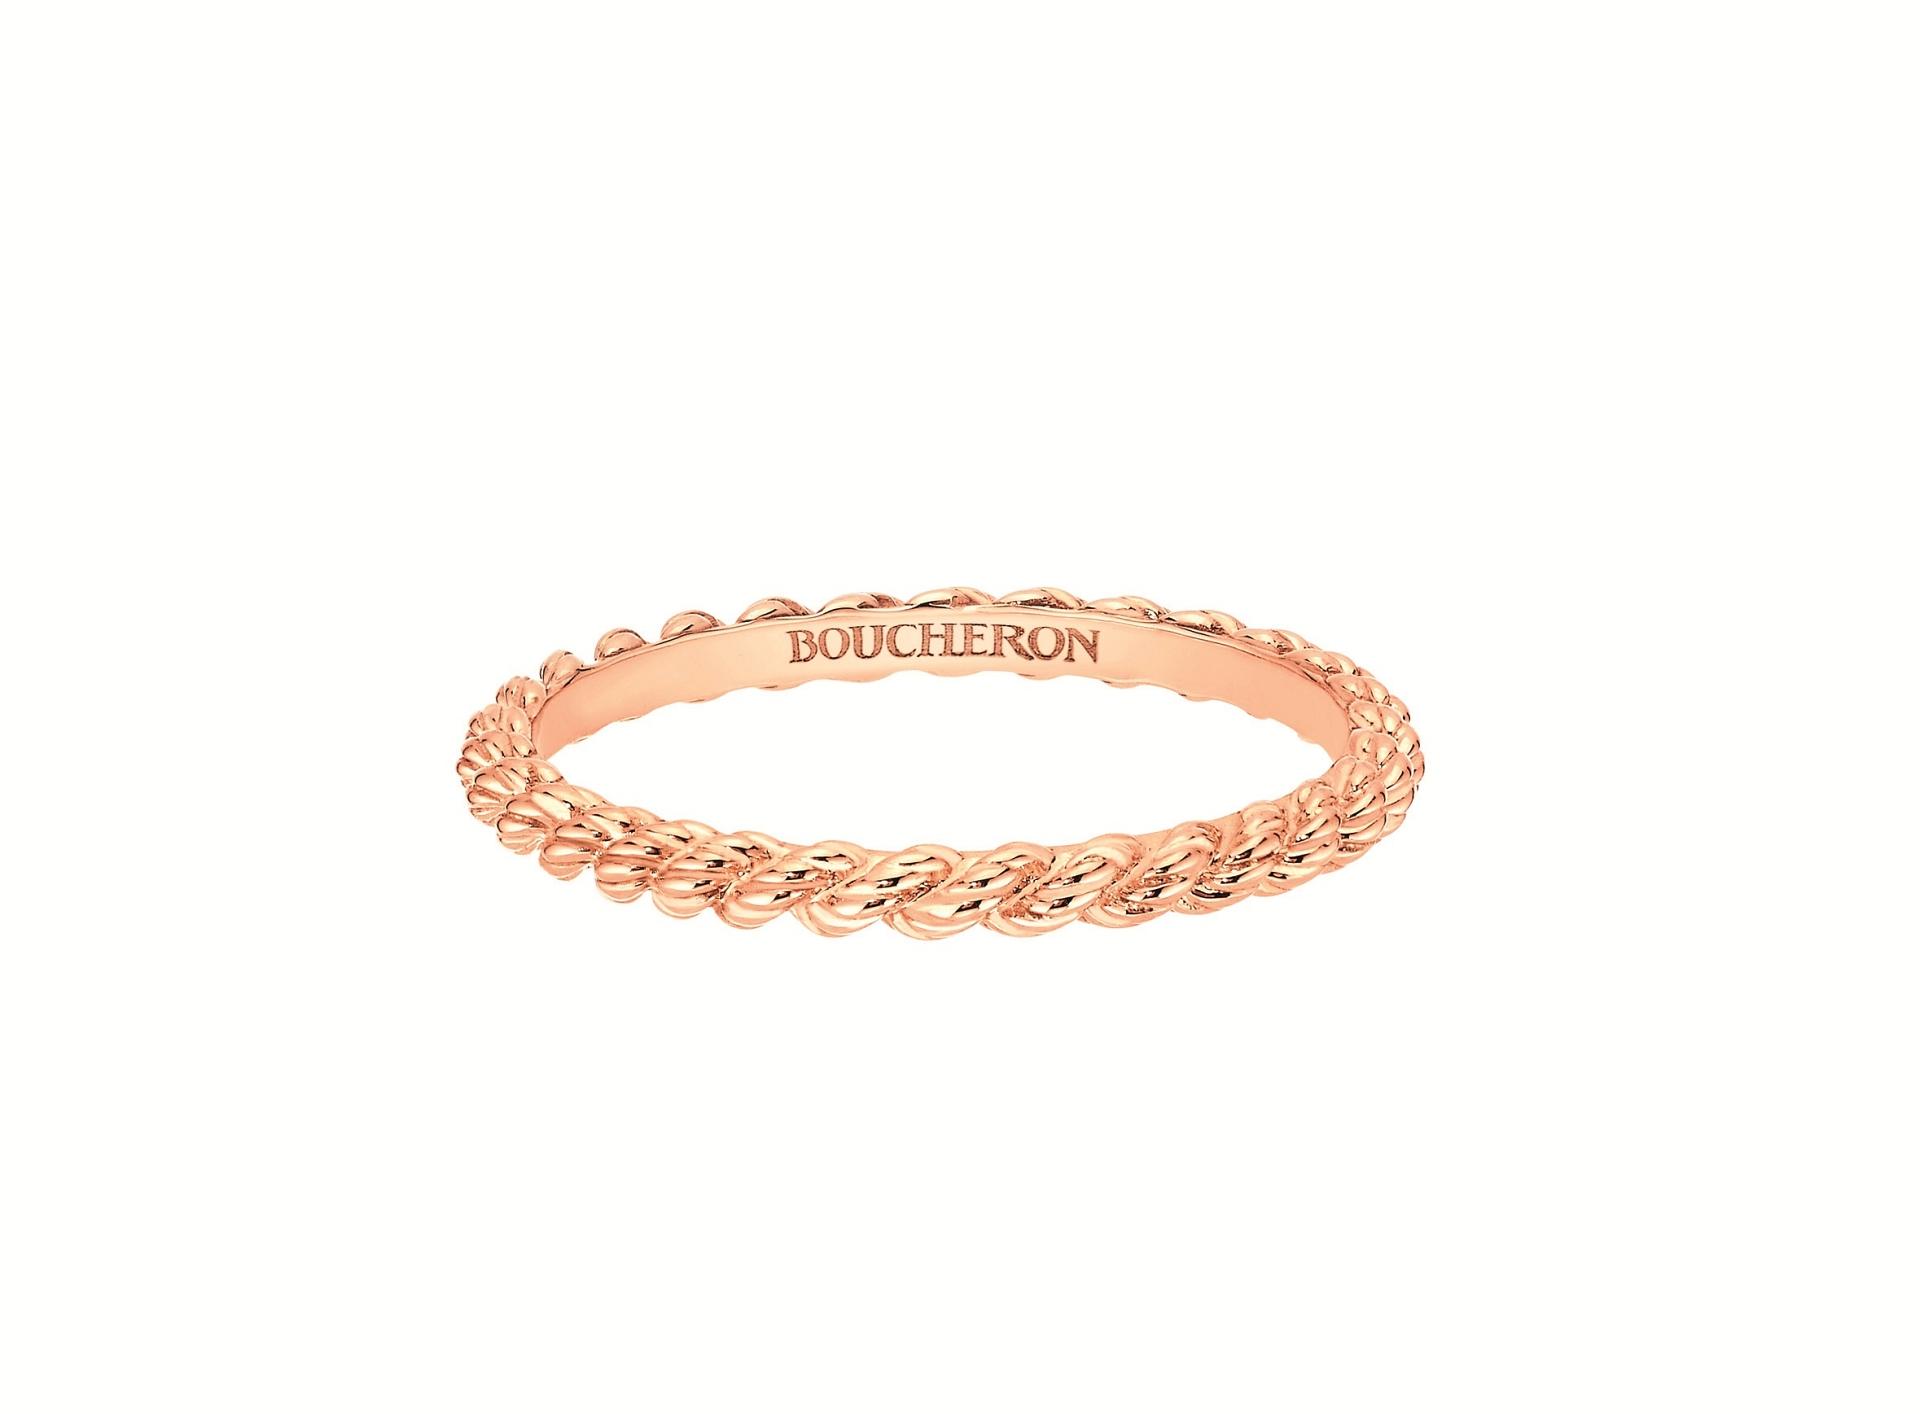 14 karat gold simple wedding ring for delicate wedding bands zoom